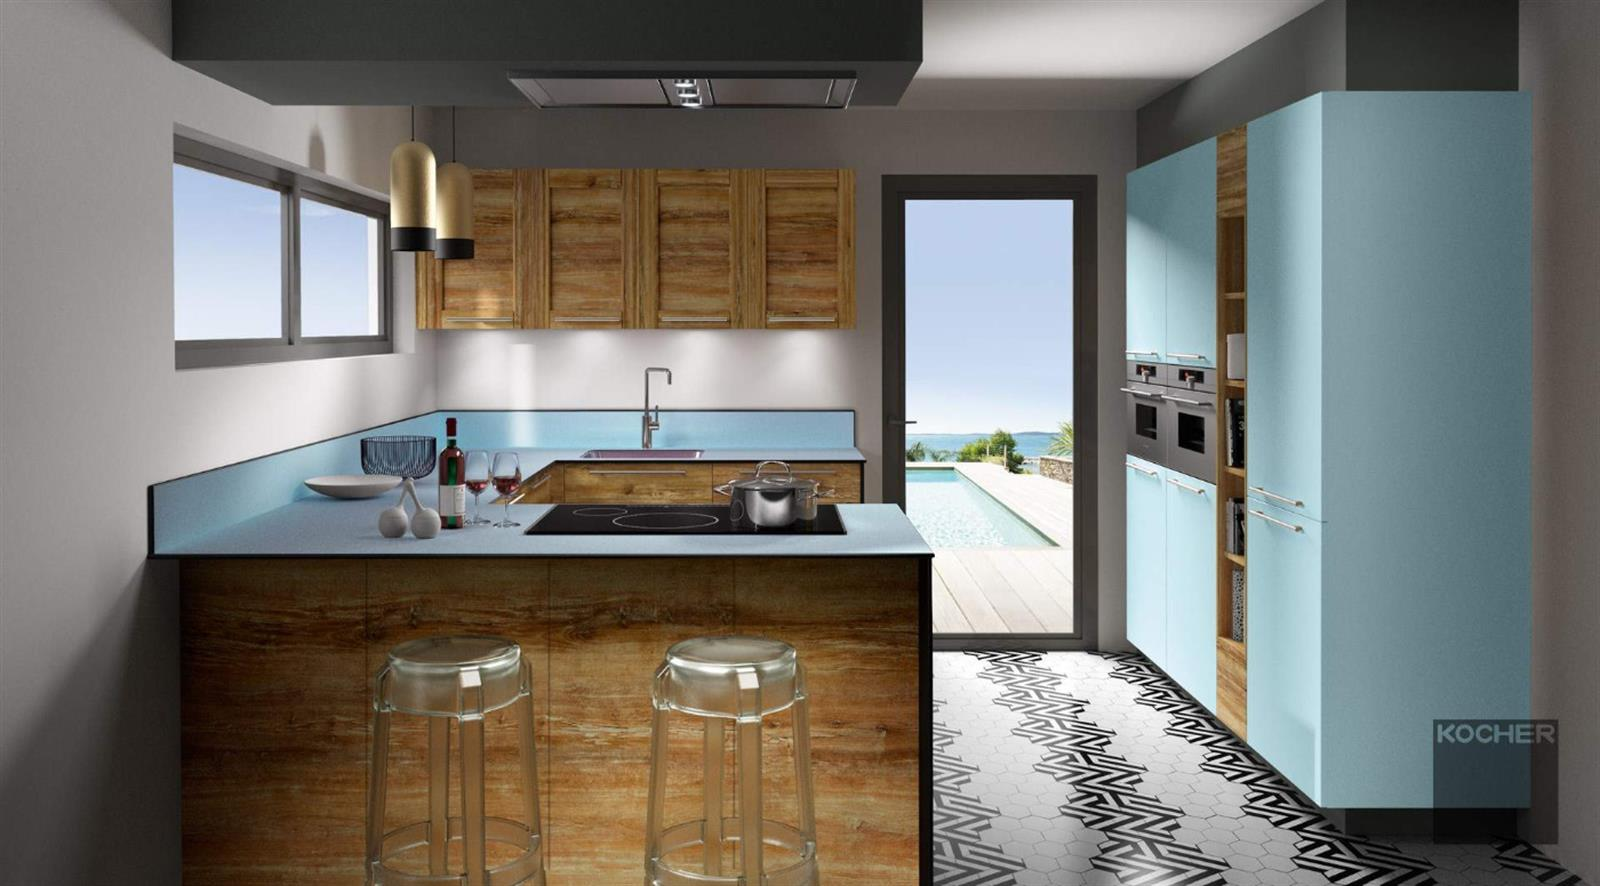 kitch n cuisine quip e electrom nager encastrable editus. Black Bedroom Furniture Sets. Home Design Ideas